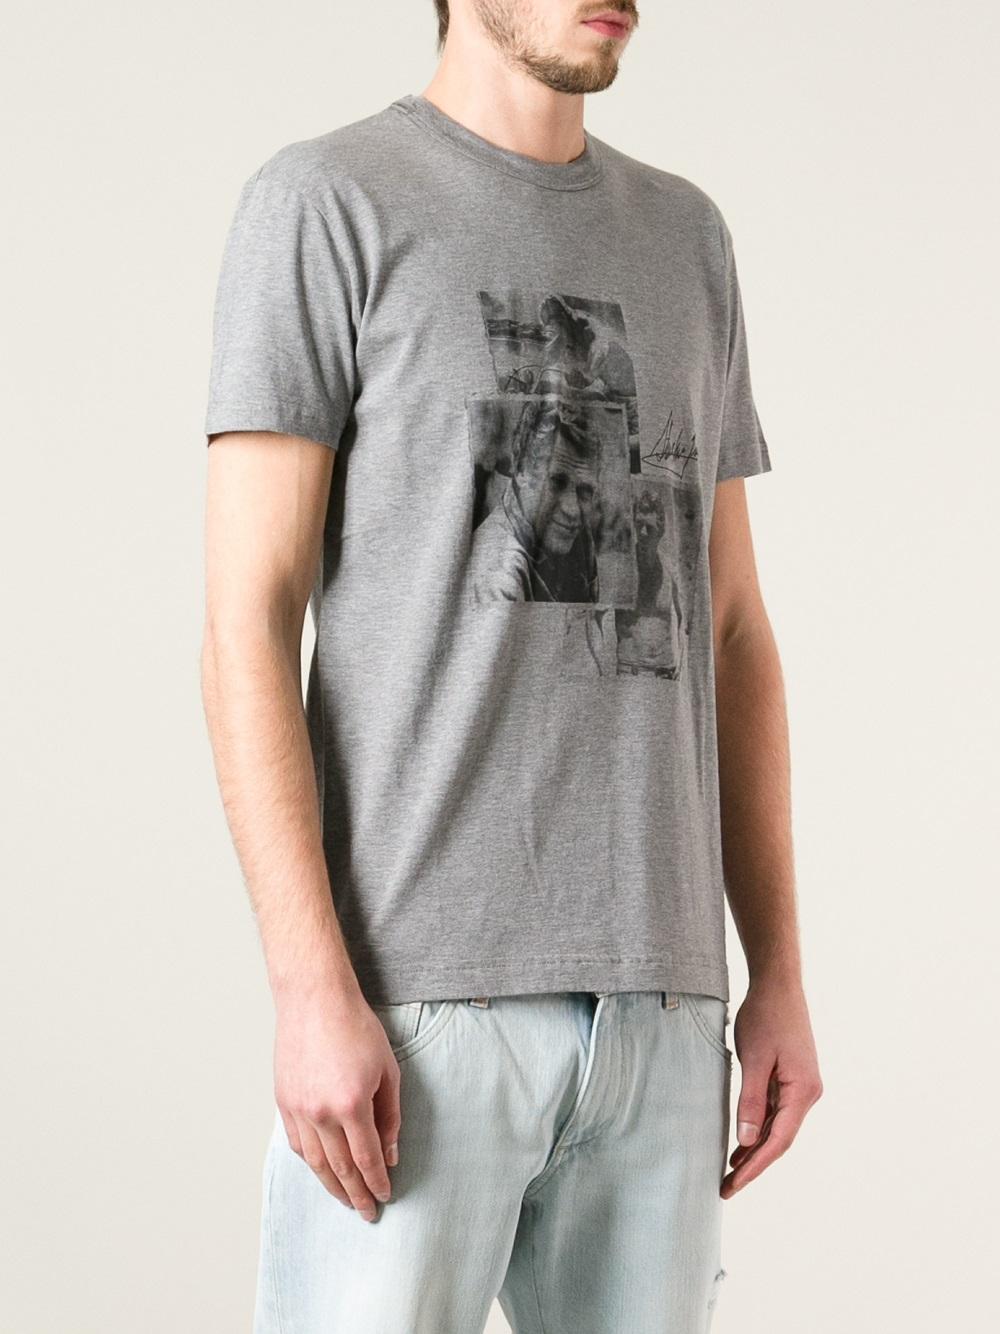 lyst dolce gabbana steve mcqueen tshirt in gray for men. Black Bedroom Furniture Sets. Home Design Ideas